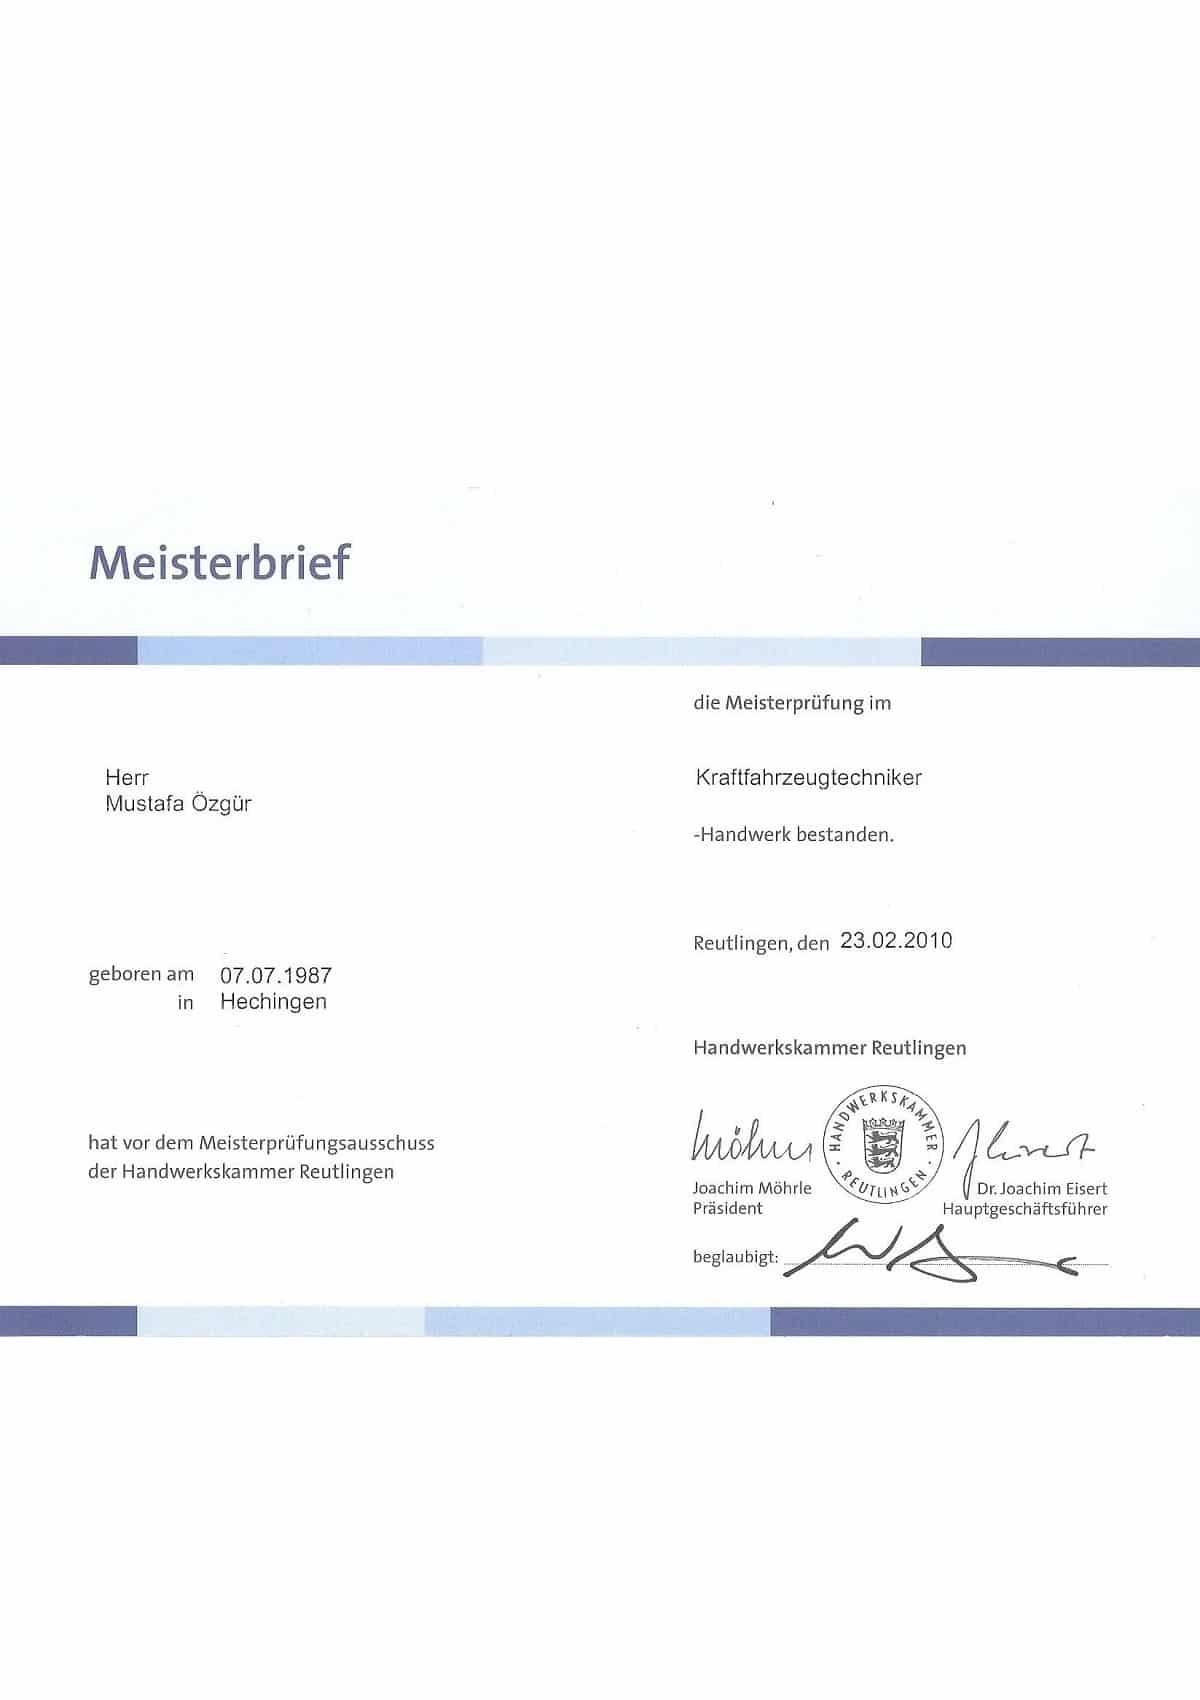 Meisterbrief KFZ Mustafa Özgür